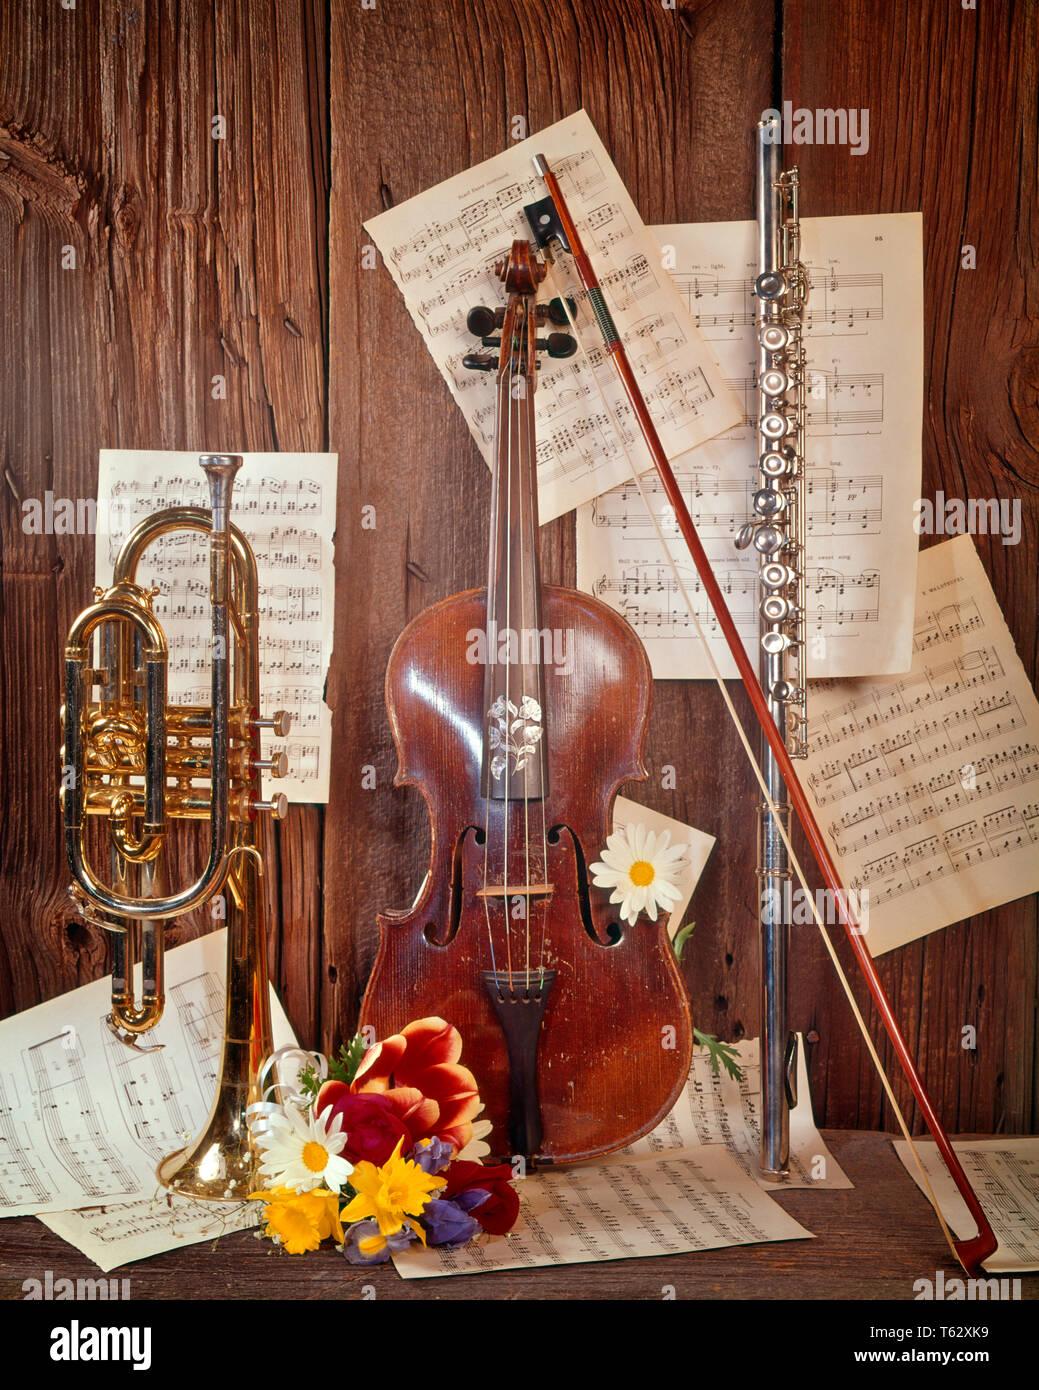 1960 INSTRUMENTOS MUSICALES BODEGÓN VIOLÍN FLAUTA TROMPETA PARTITURAS FLORES - km1924 HAR001 HARS ANTICUADO Imagen De Stock